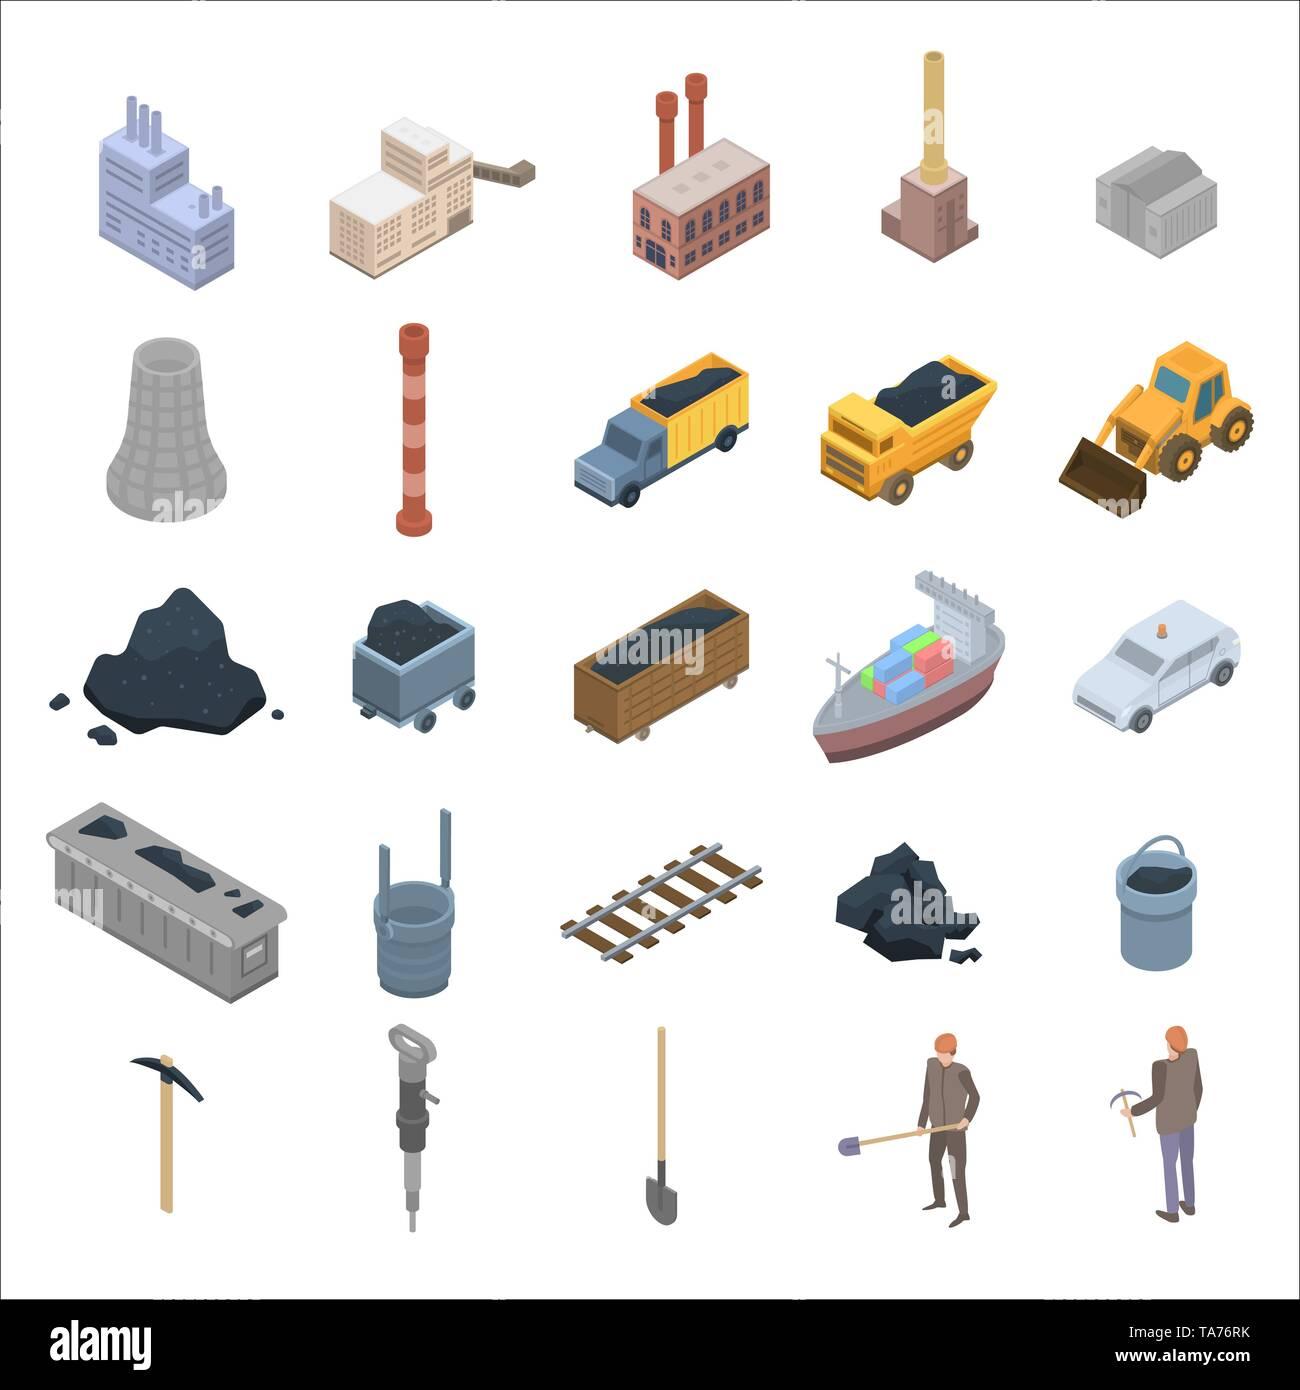 Coal industry icons set, isometric style - Stock Image